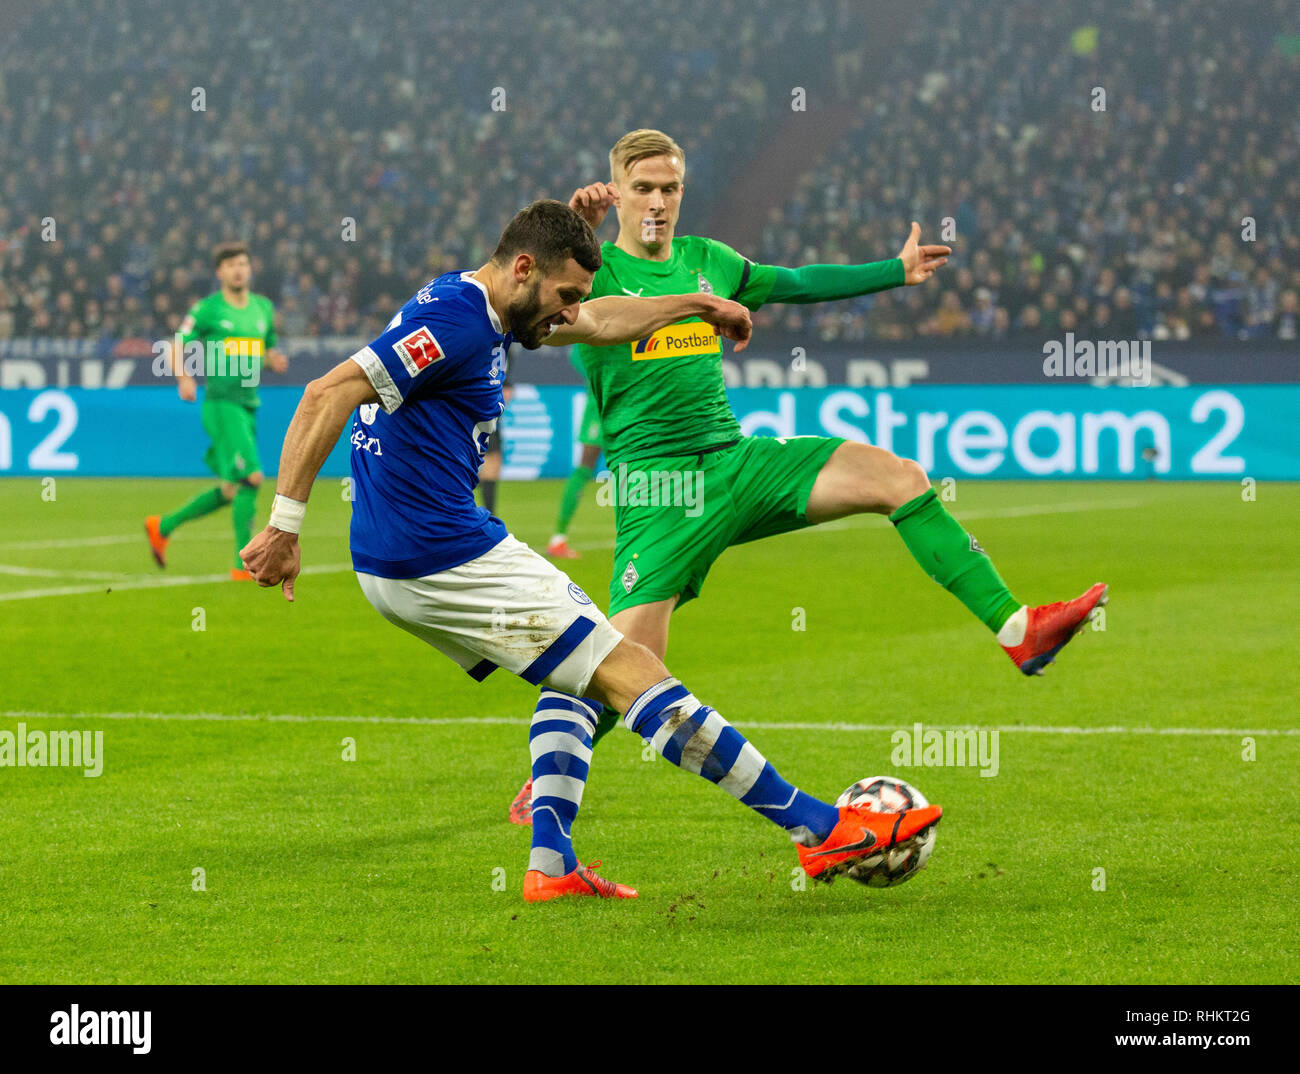 sports, football, Bundesliga, 2018/2019, FC Schalke 04 vs Borussia Moenchengladbach 0-2, Veltins Arena Gelsenkirchen, scene of the match, cross by Daniel Caligiuri (S04), right Oscar Wendt (MG), DFL REGULATIONS PROHIBIT ANY USE OF PHOTOGRAPHS AS IMAGE SEQUENCES AND/OR QUASI-VIDEO - Stock Image